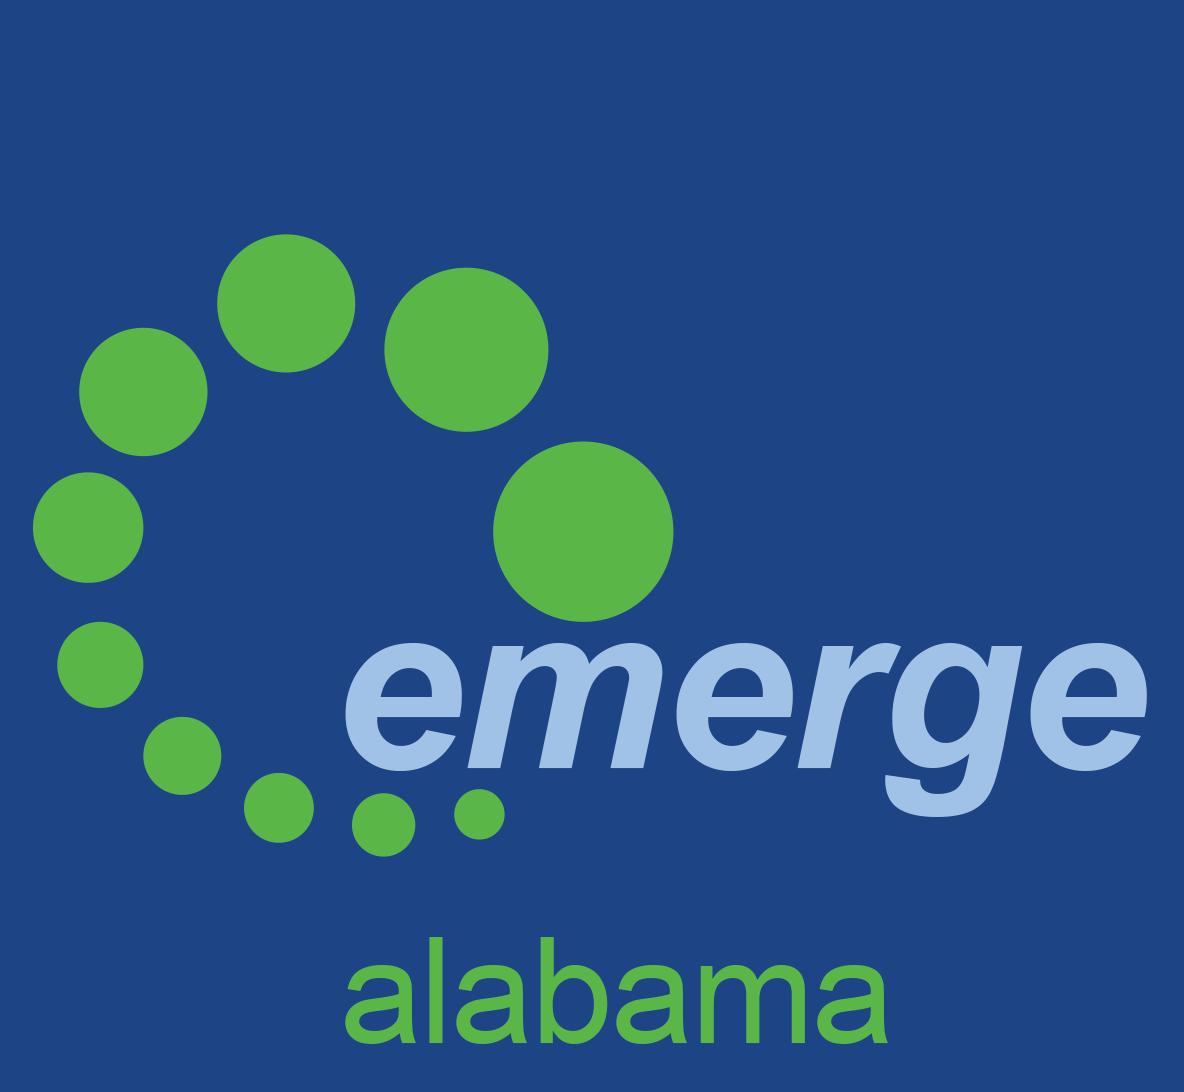 Emerge Alabama